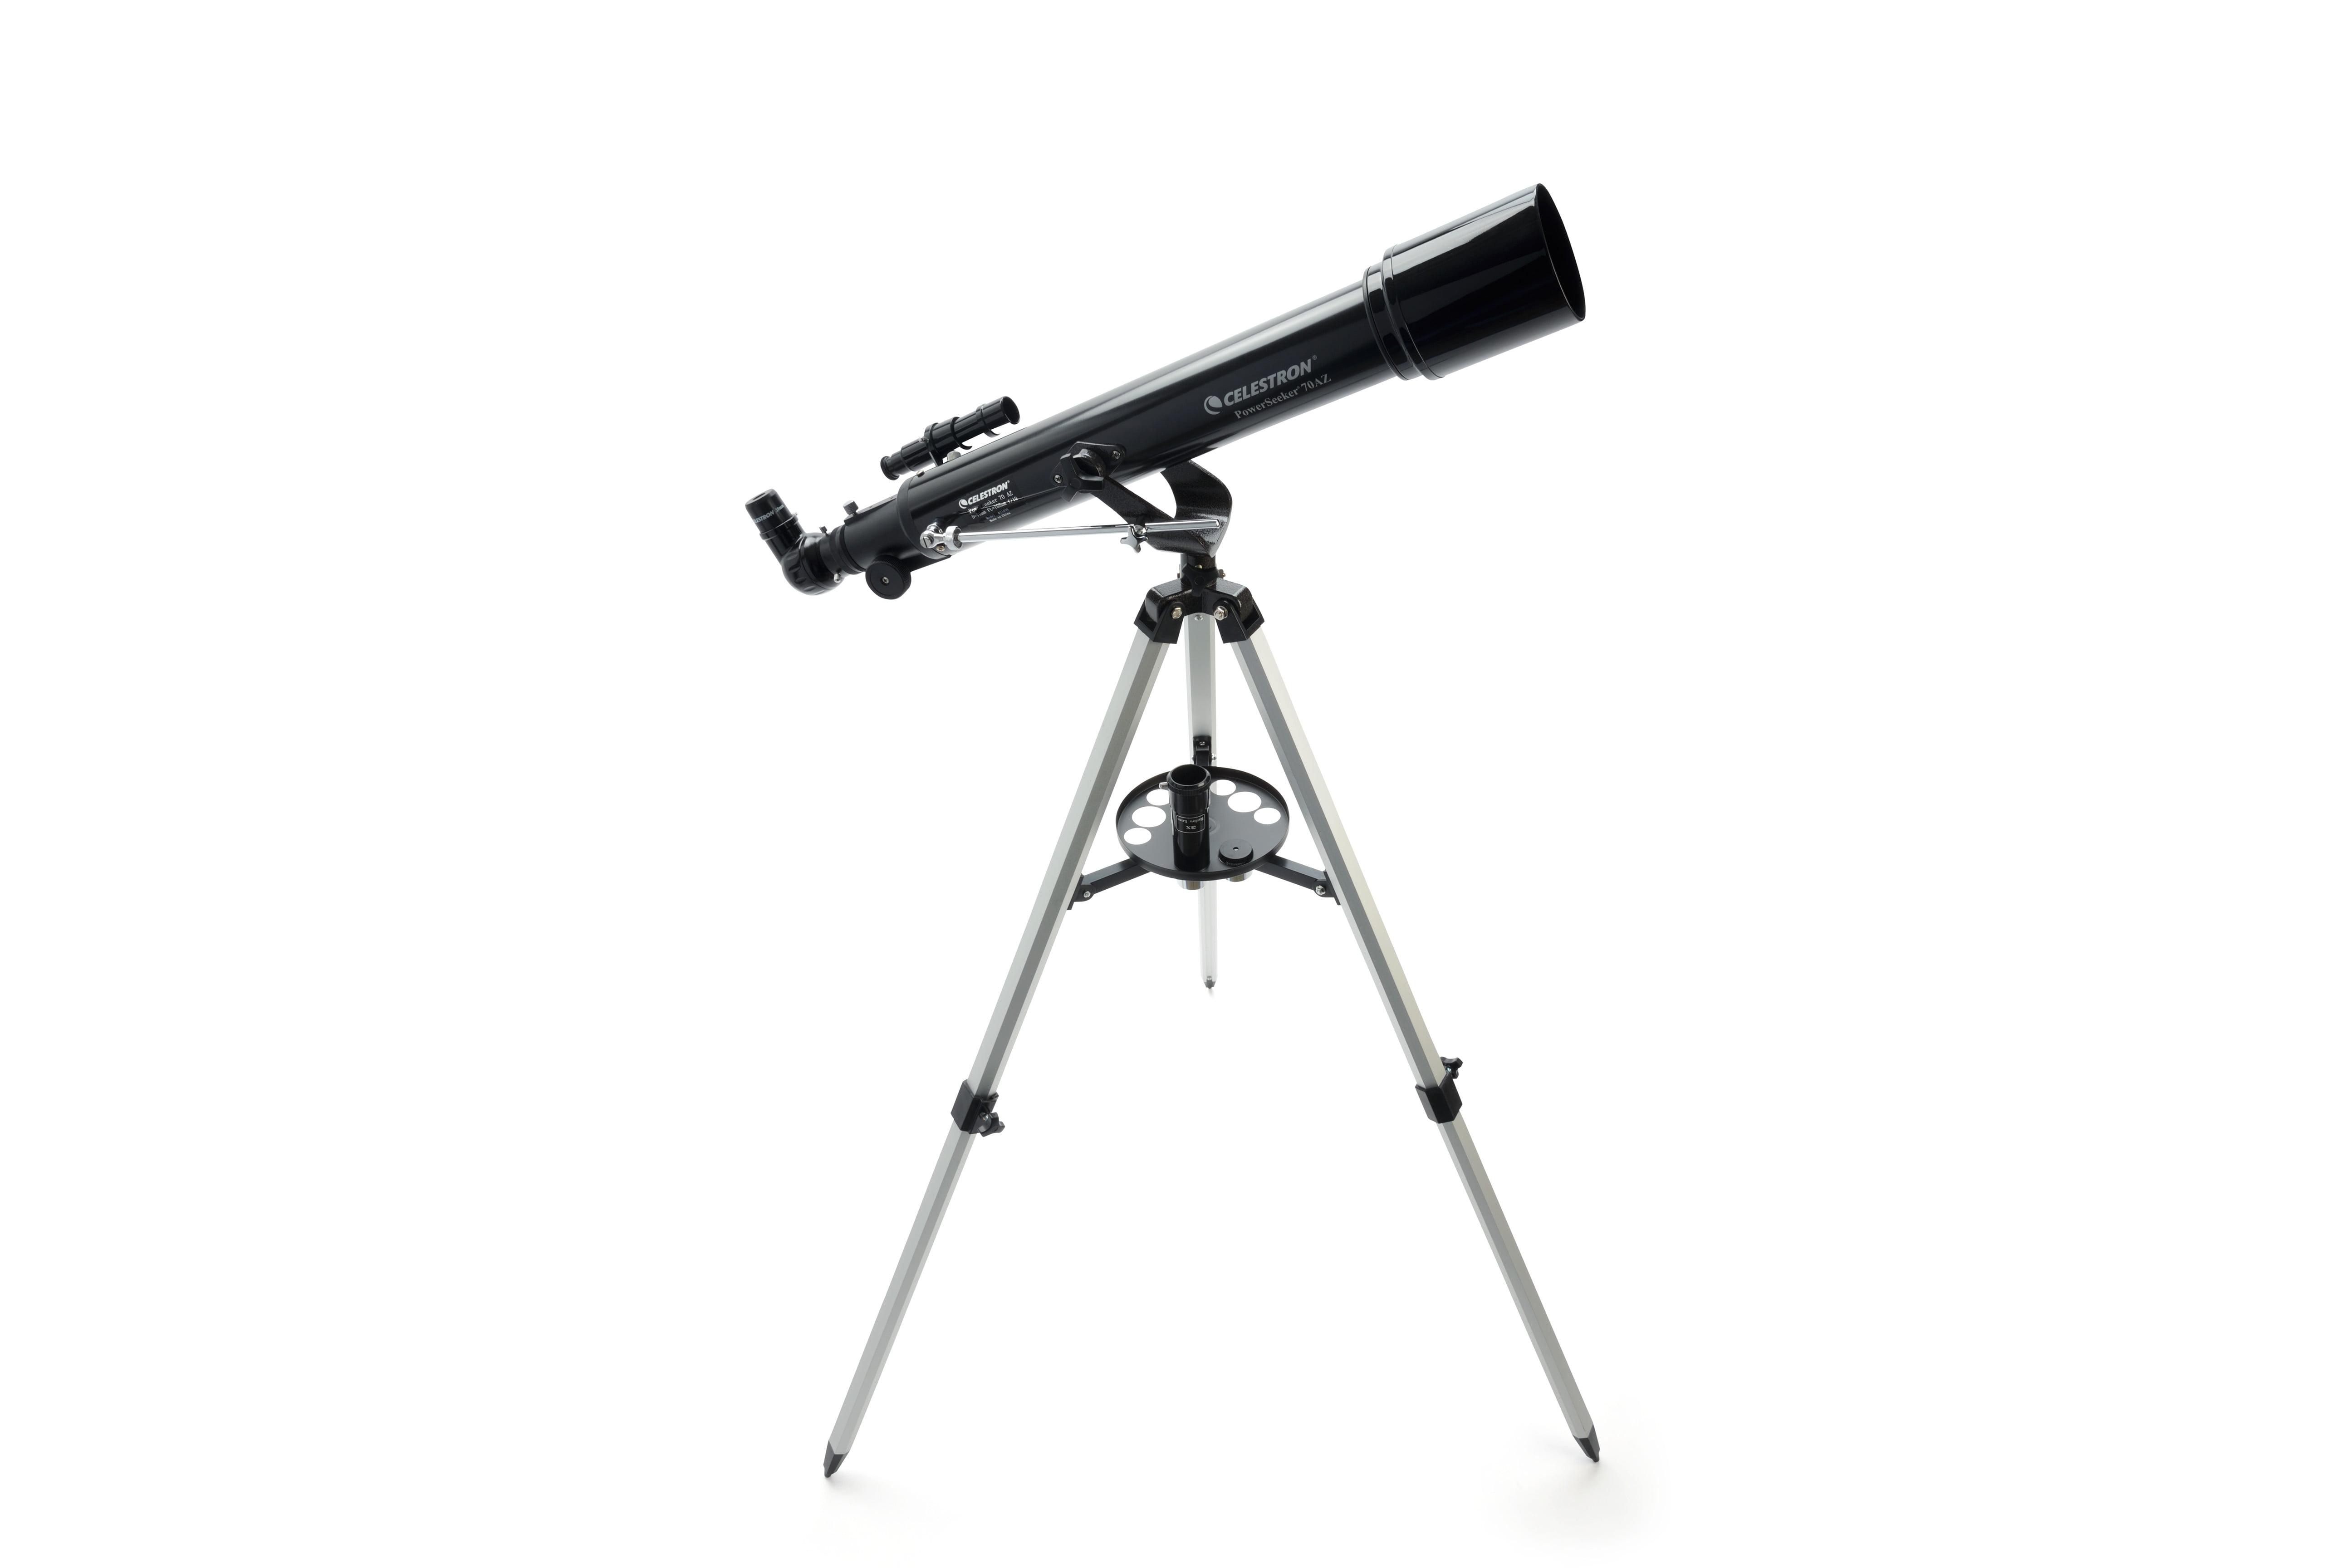 Celestron powerseeker 60az telescope walmart.com